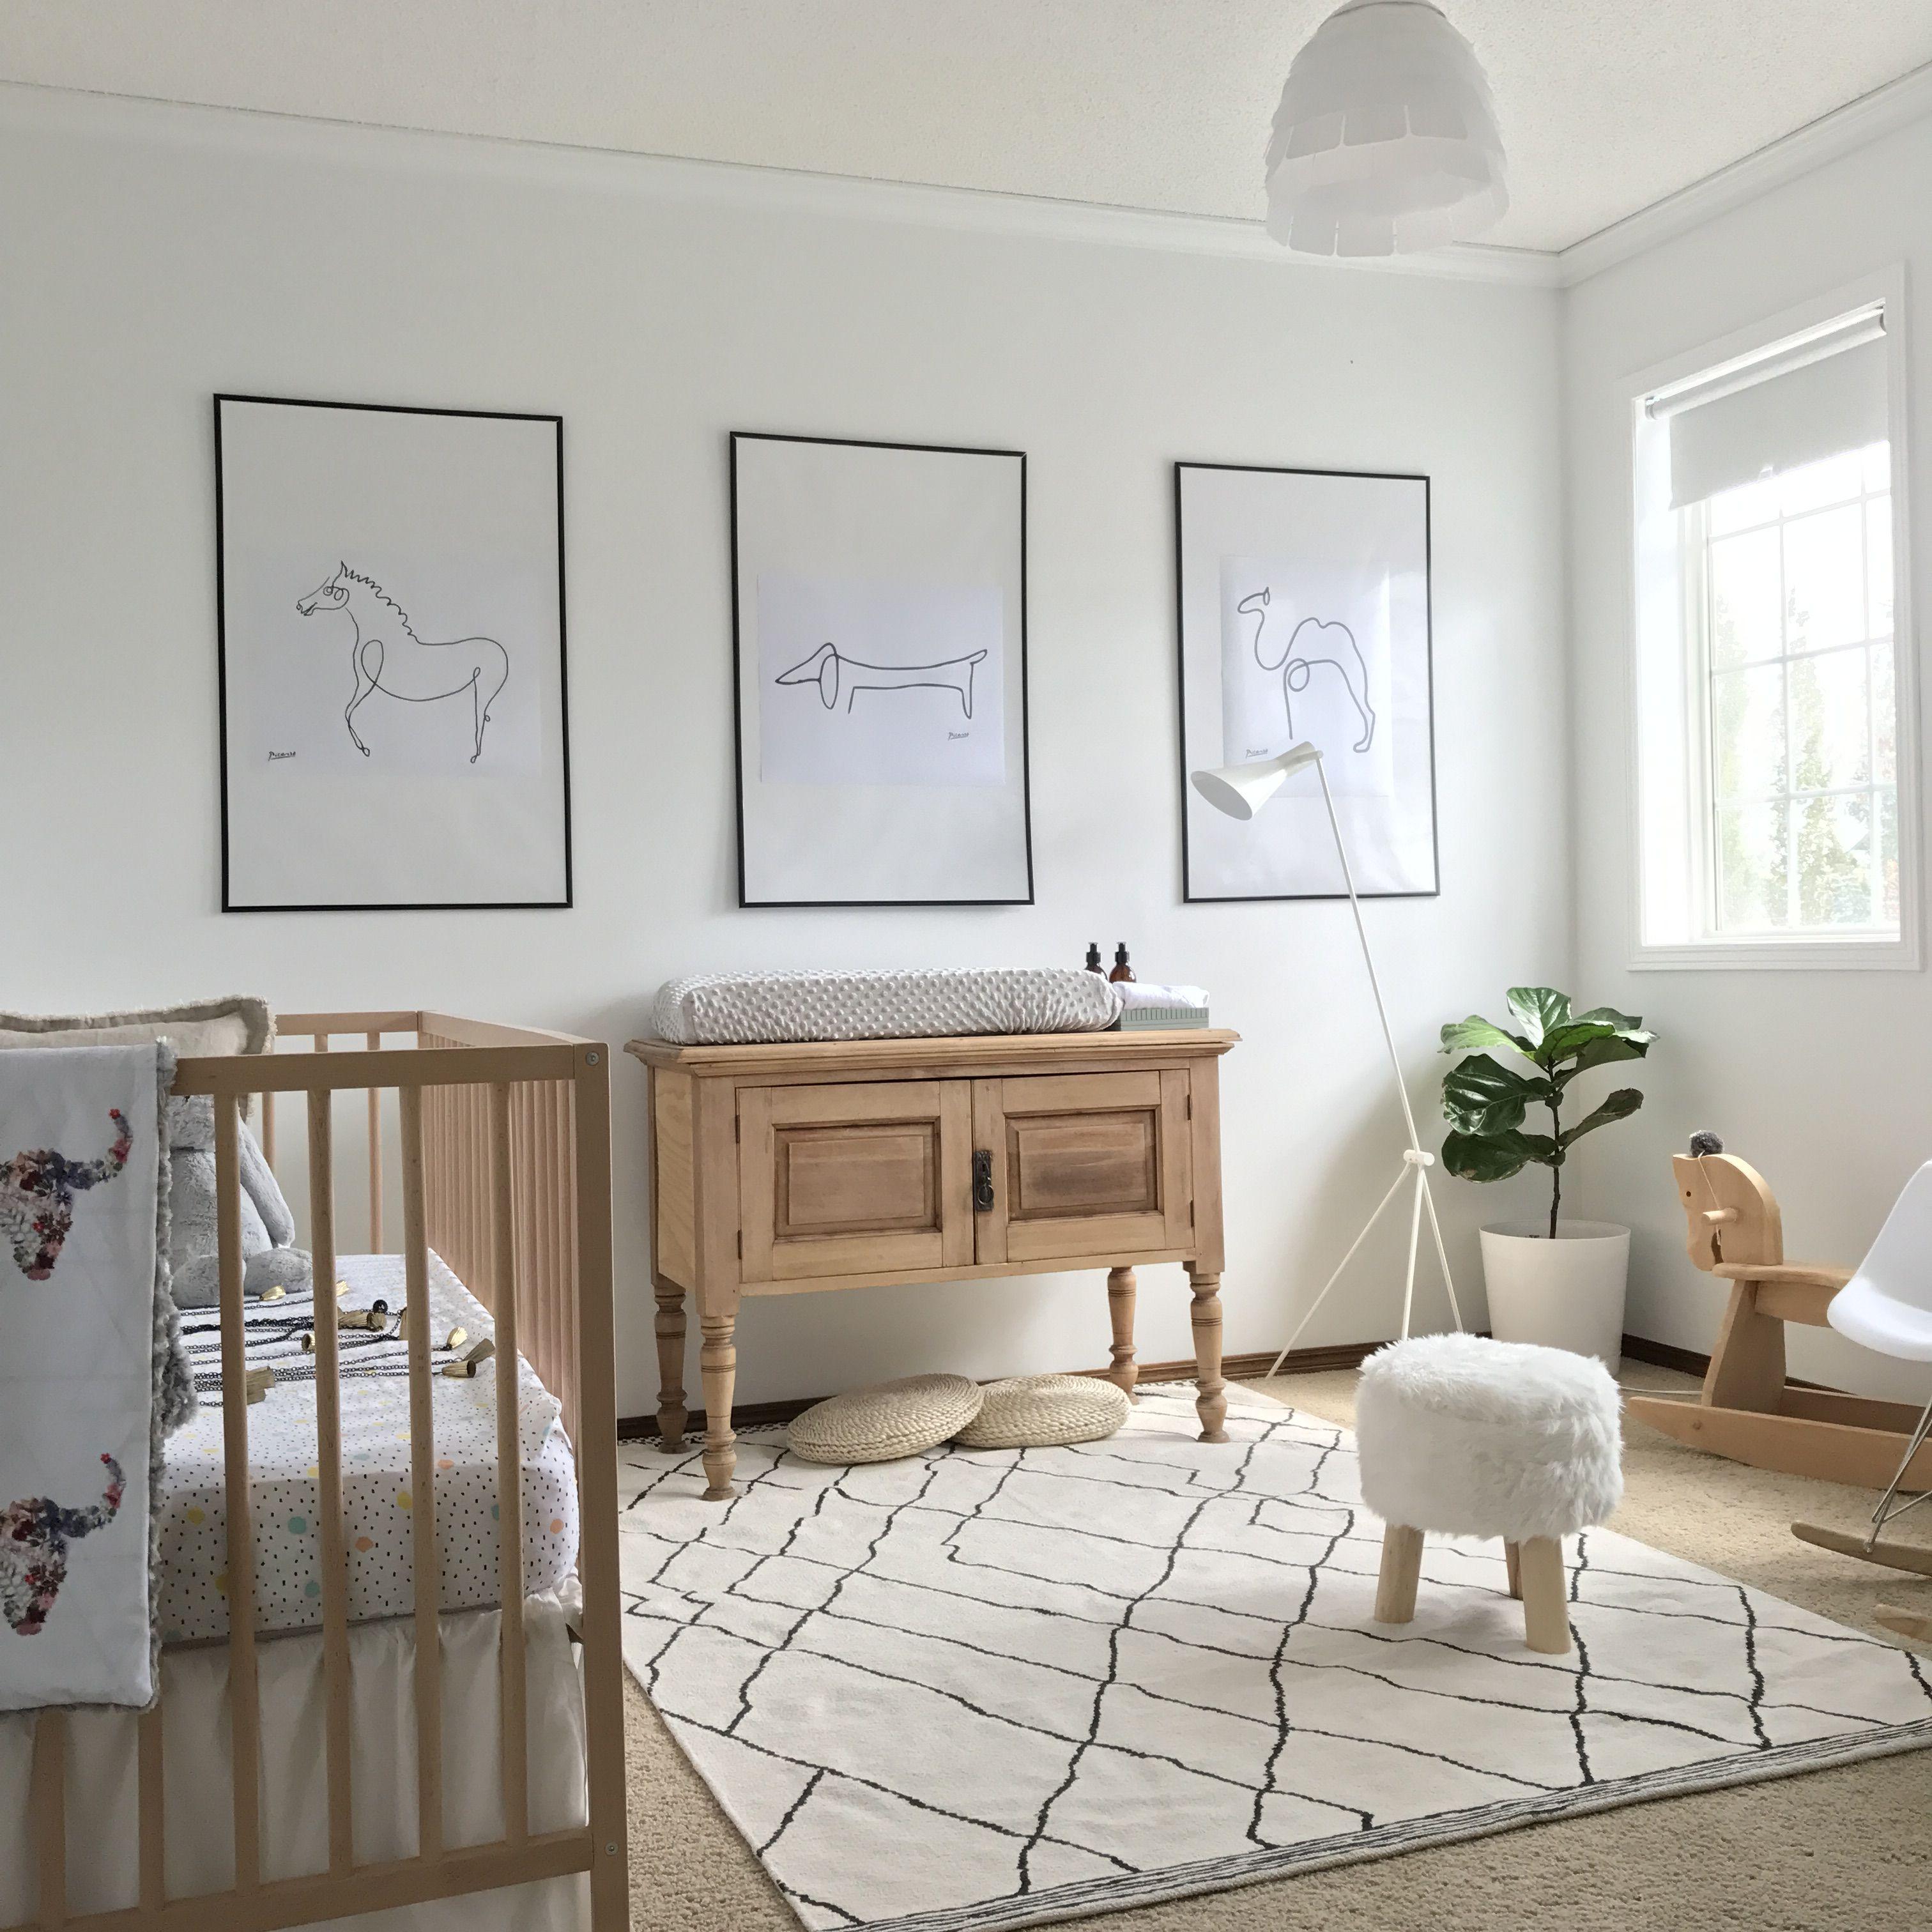 Scandinavian Nursery Gender Neutral Nursery Baby Nursery Babies Room Nursery Baby Room Baby Room Design Small Room Nursery